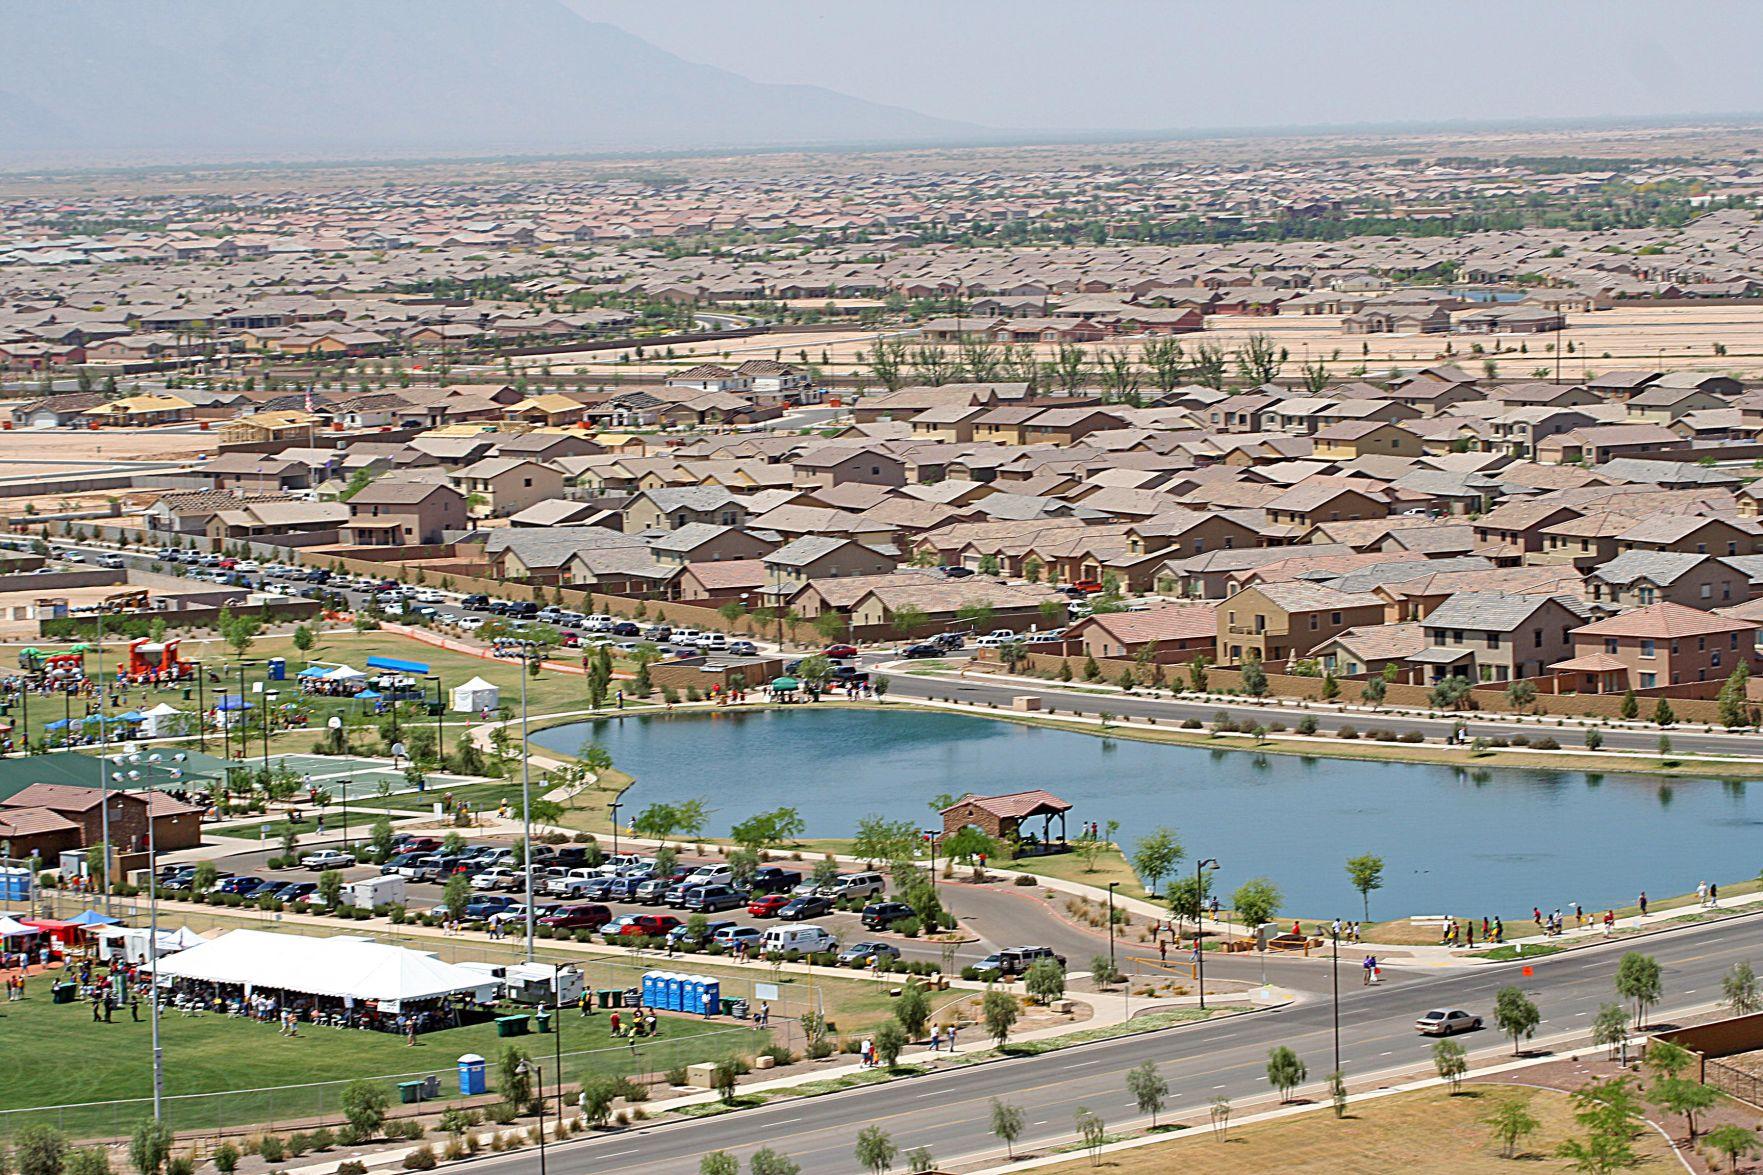 Maricopa Surpasses Key 50 000 Population Milestone News Pinalcentral Com